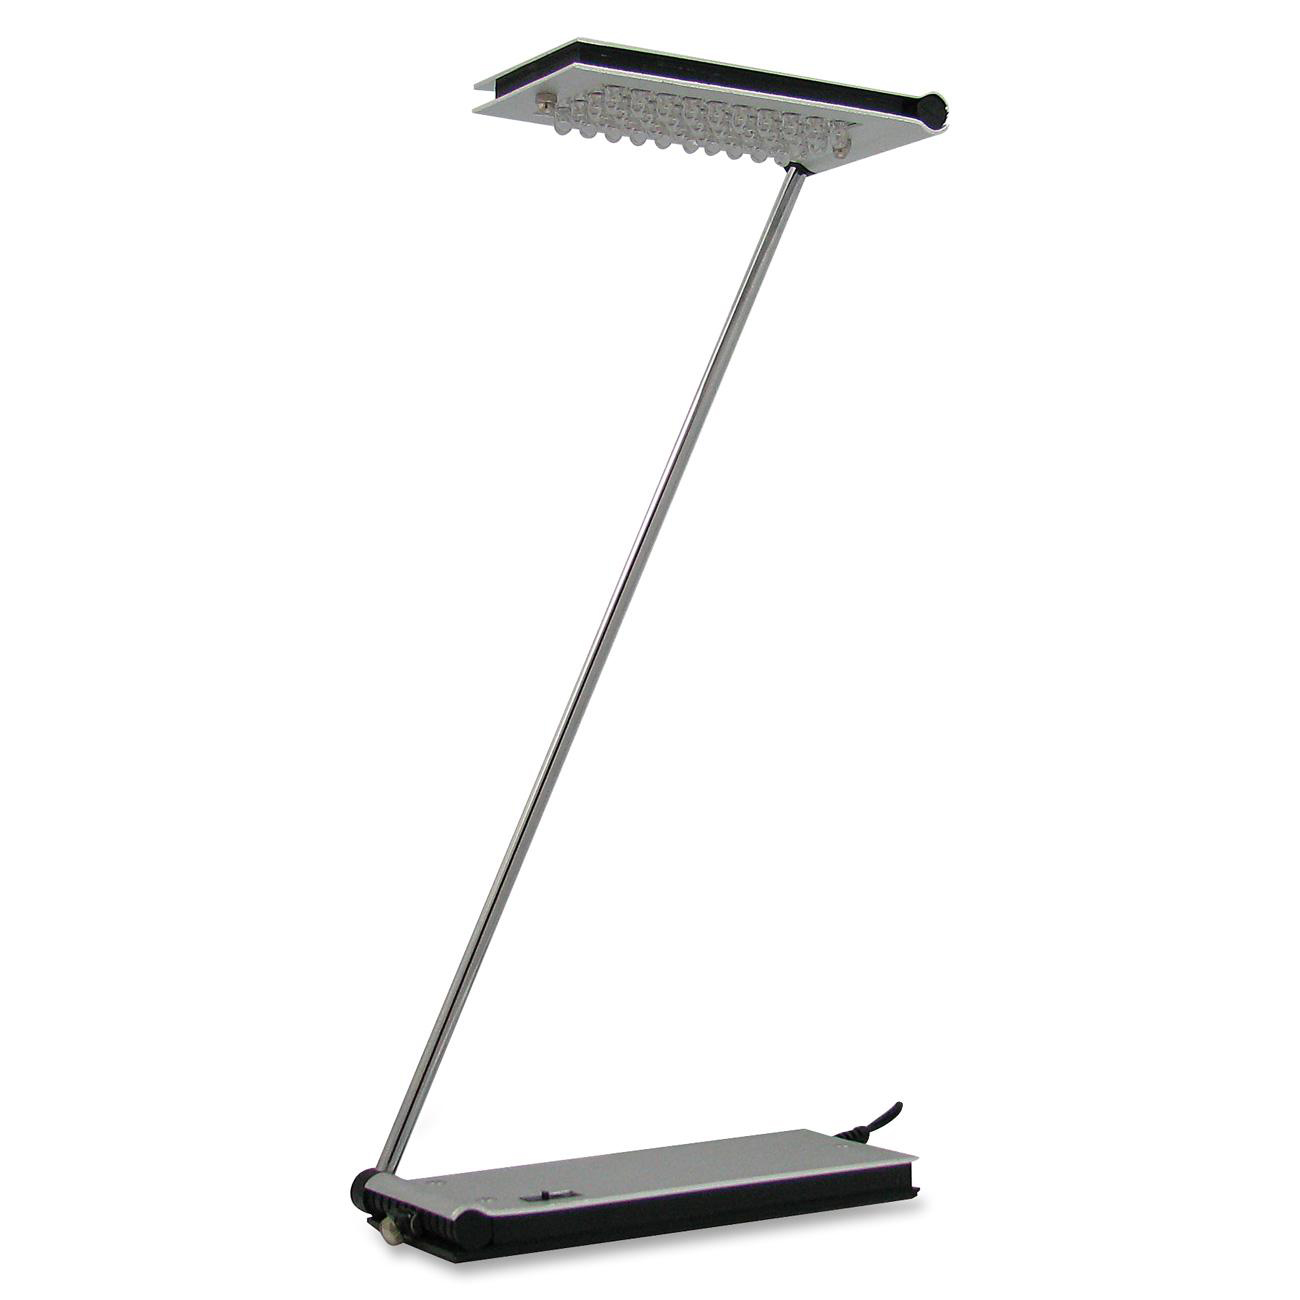 Kamloops Office Systems Furniture Decor Lighting Lamps Vision Rana Desk Lamp 2 W Led Bulb Brushed Aluminum